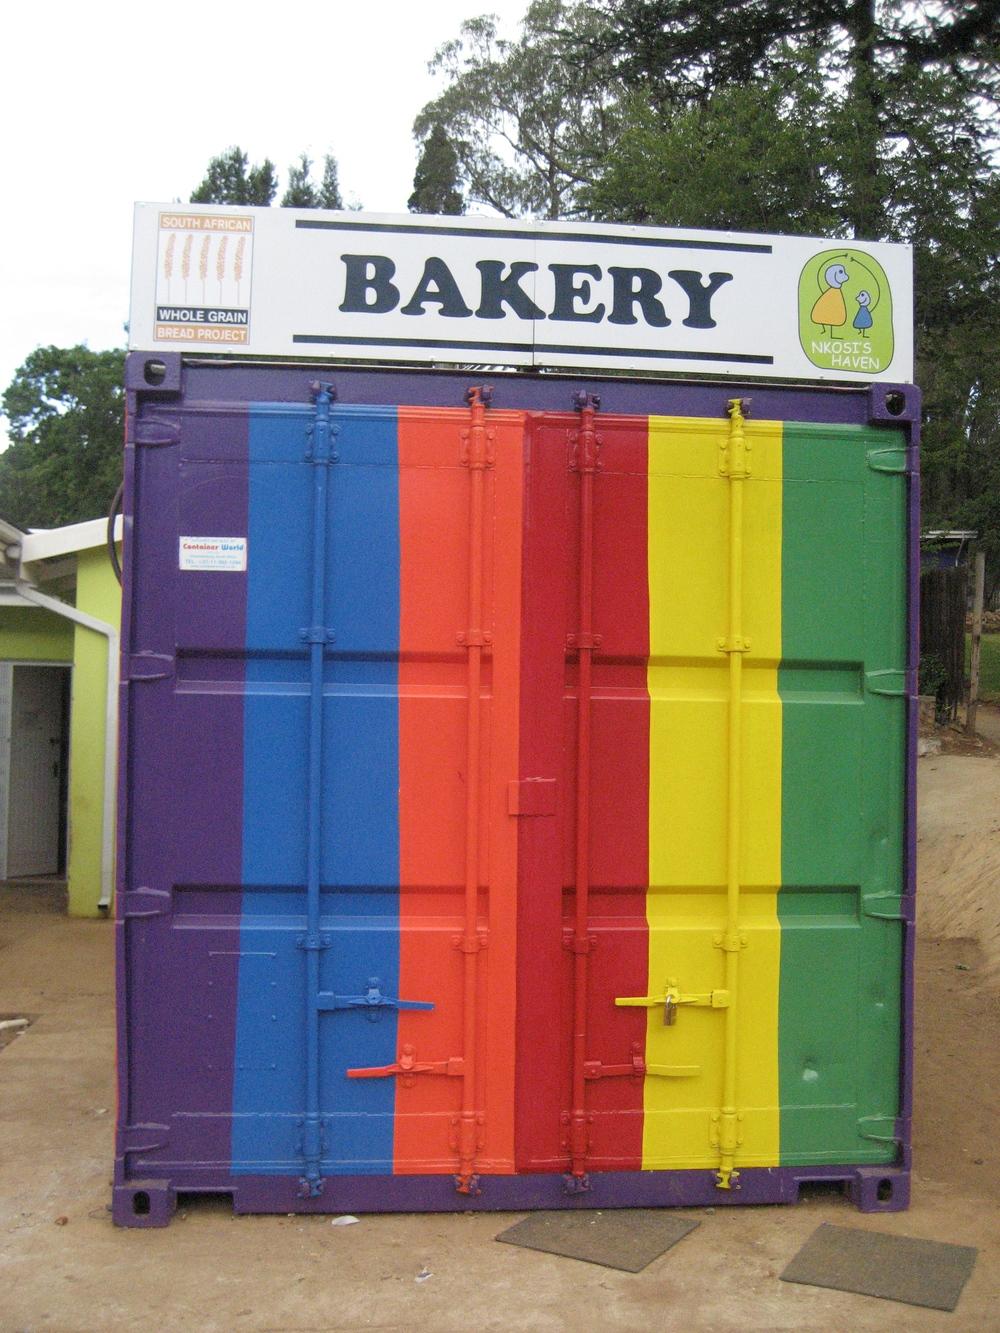 Nkosi Bakery front.jpg